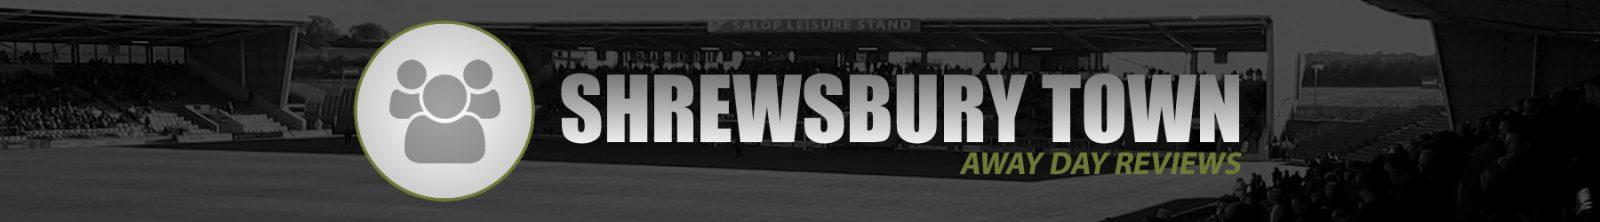 Review Shrewsbury Town